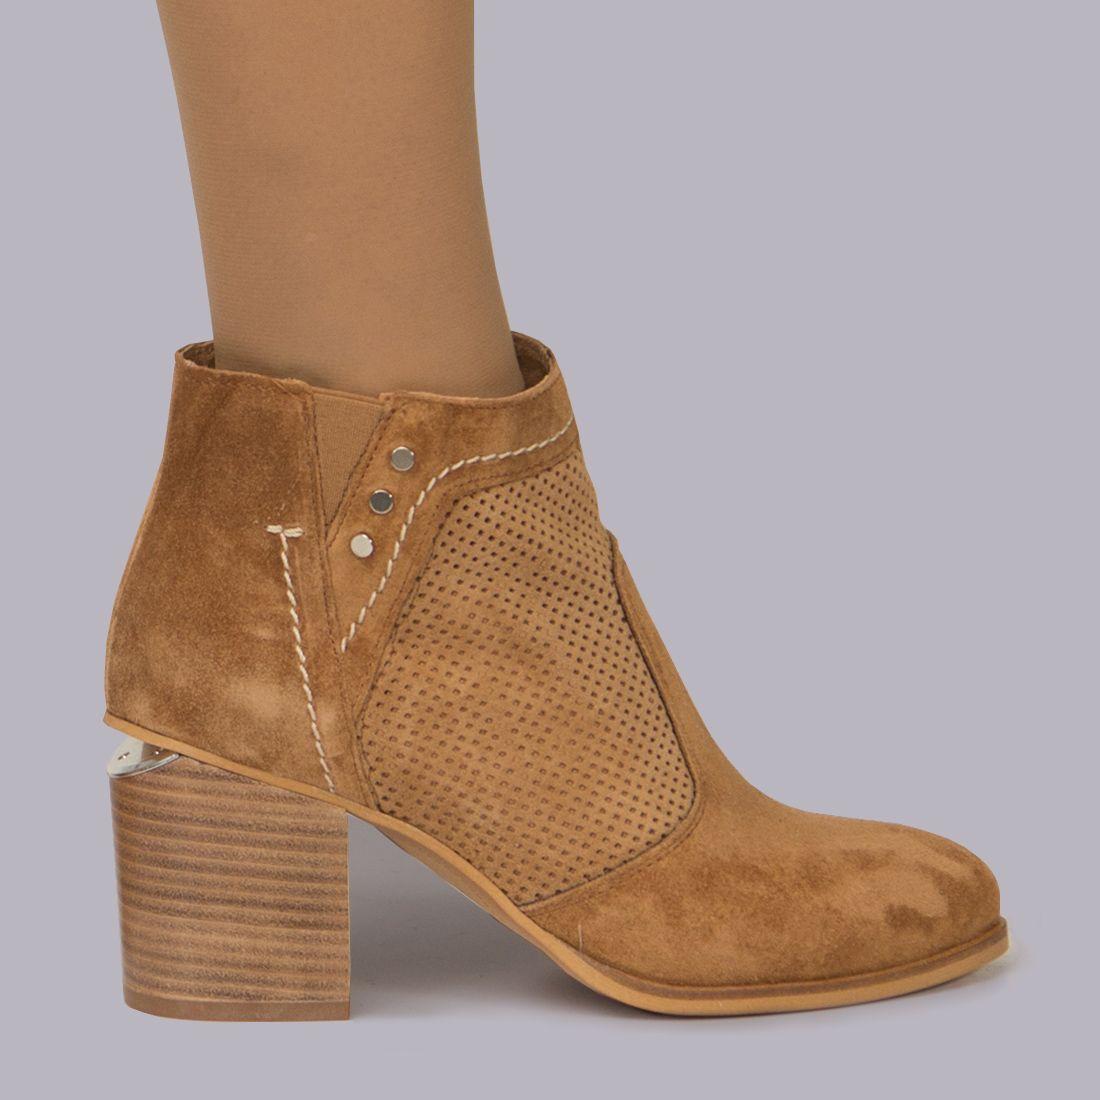 hijo Anotar Instrumento  ALPE 4004 11 MARRON Zacaris zapatos online. | Zapatos, Marcas zapatos mujer,  Botines